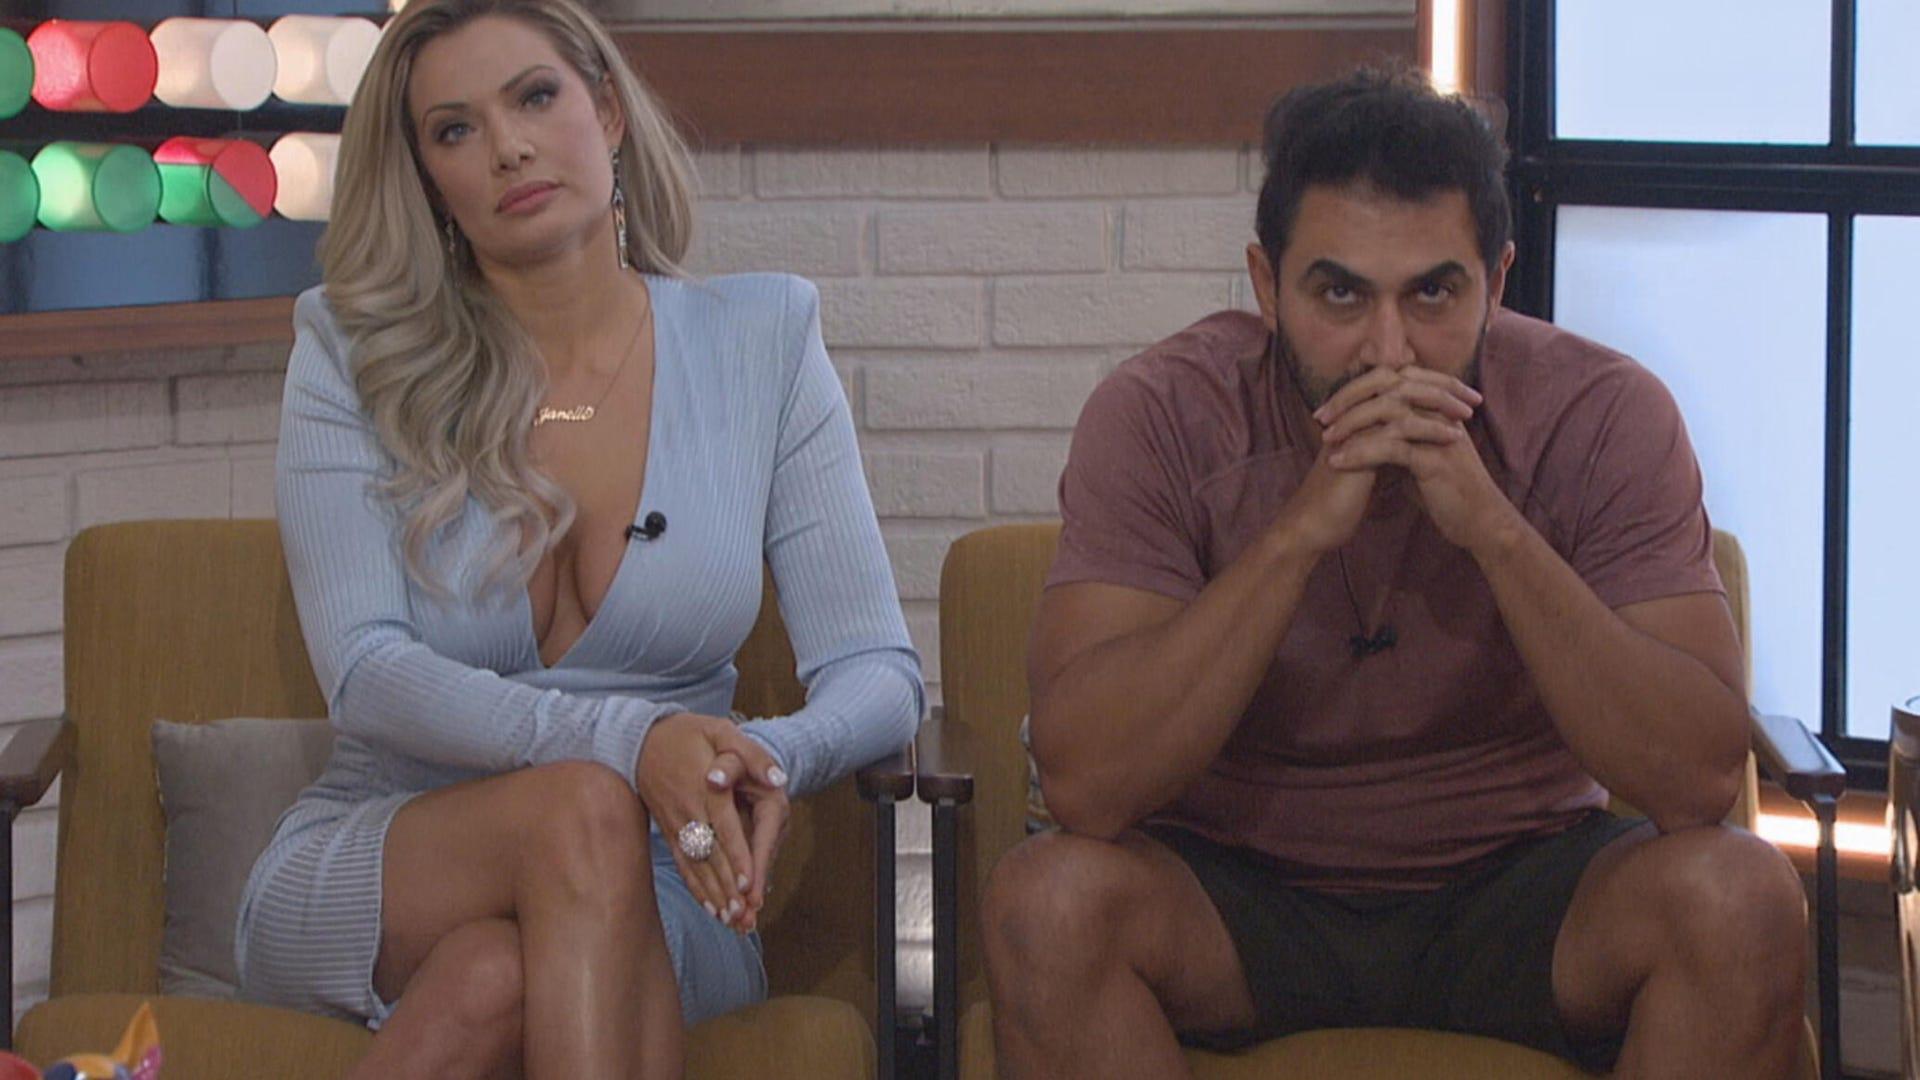 Janelle Pierzina and Kaysar Ridha, Big Brother All-Stars